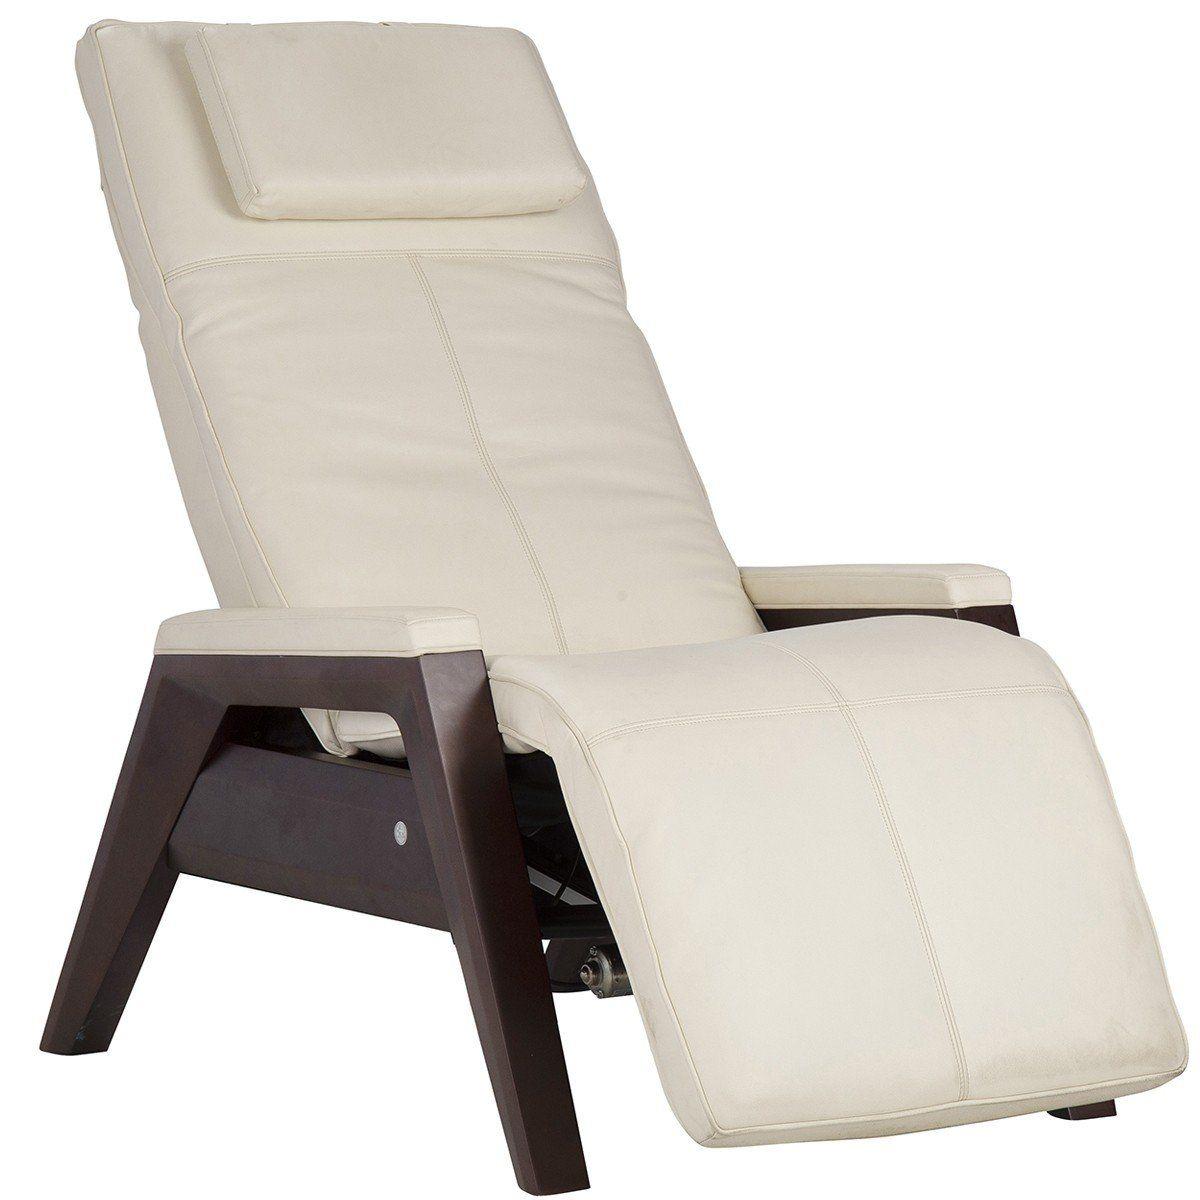 Human touch gravis zero gravity recliner with air massage